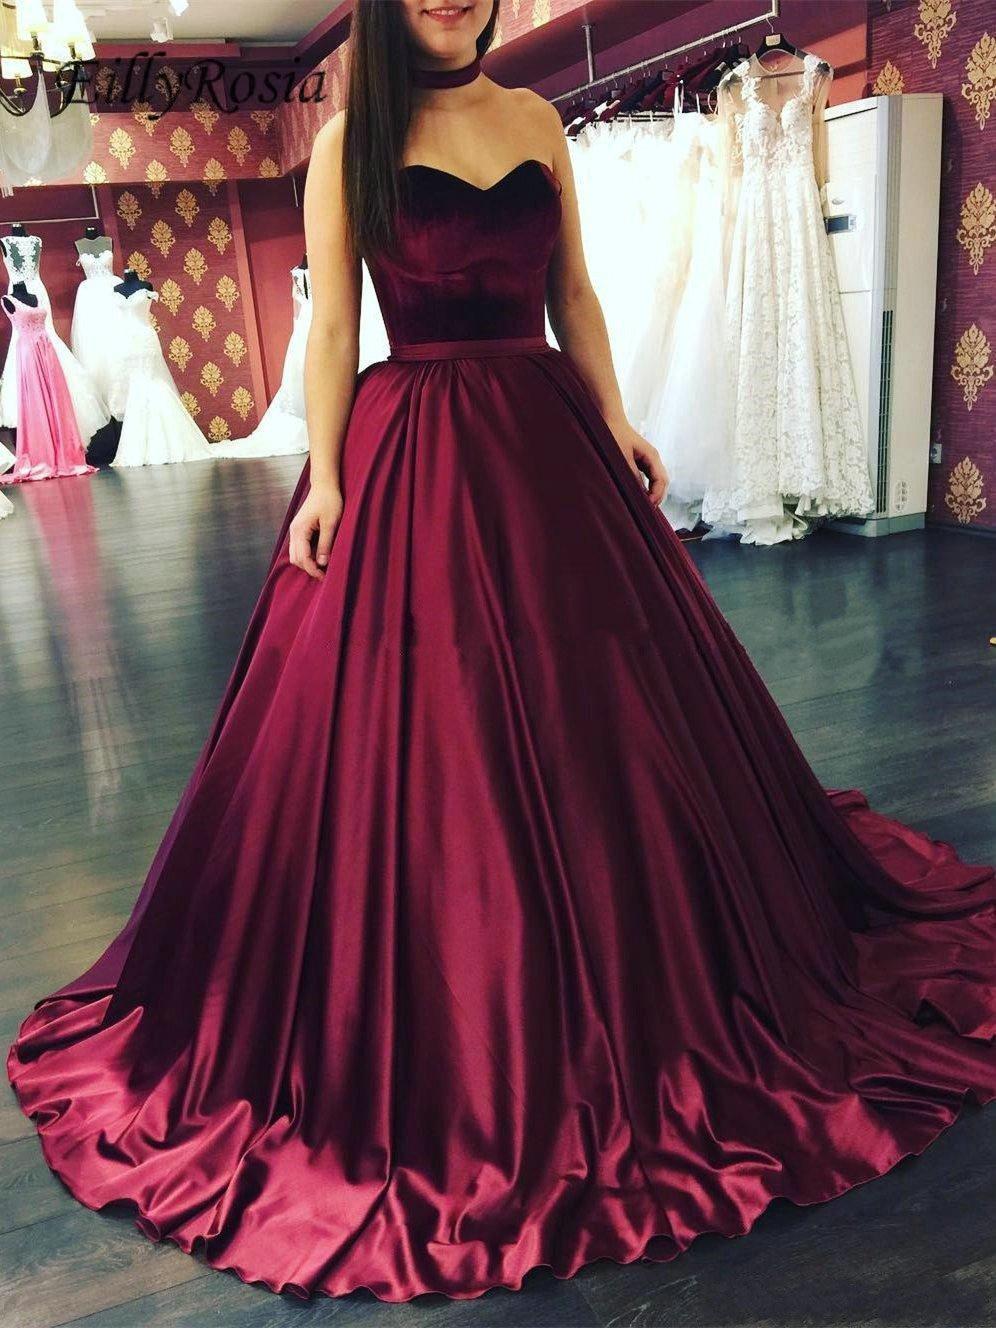 Big Discount Dark Red Satin Burgundy Prom Dresses Ball Gown Sweetheart  Sweep Train Elegant Grils Graduation Gala Dress ballkleider lang 20  October